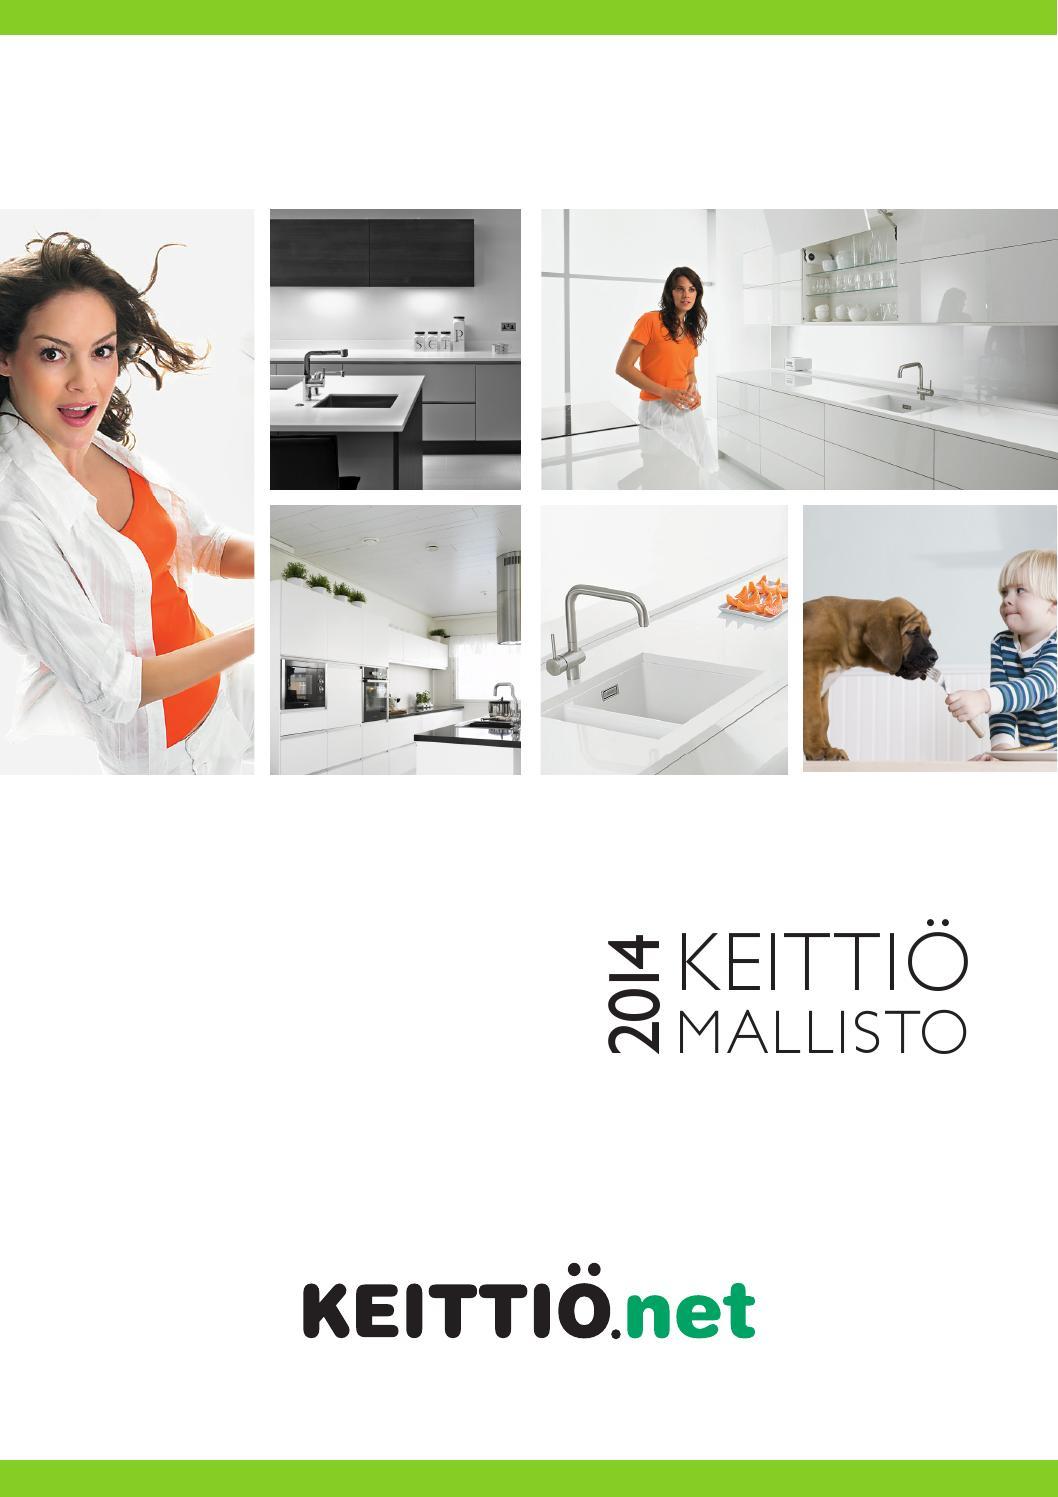 Keittionet kuvasto 2014 by Ideal keittiöt  issuu